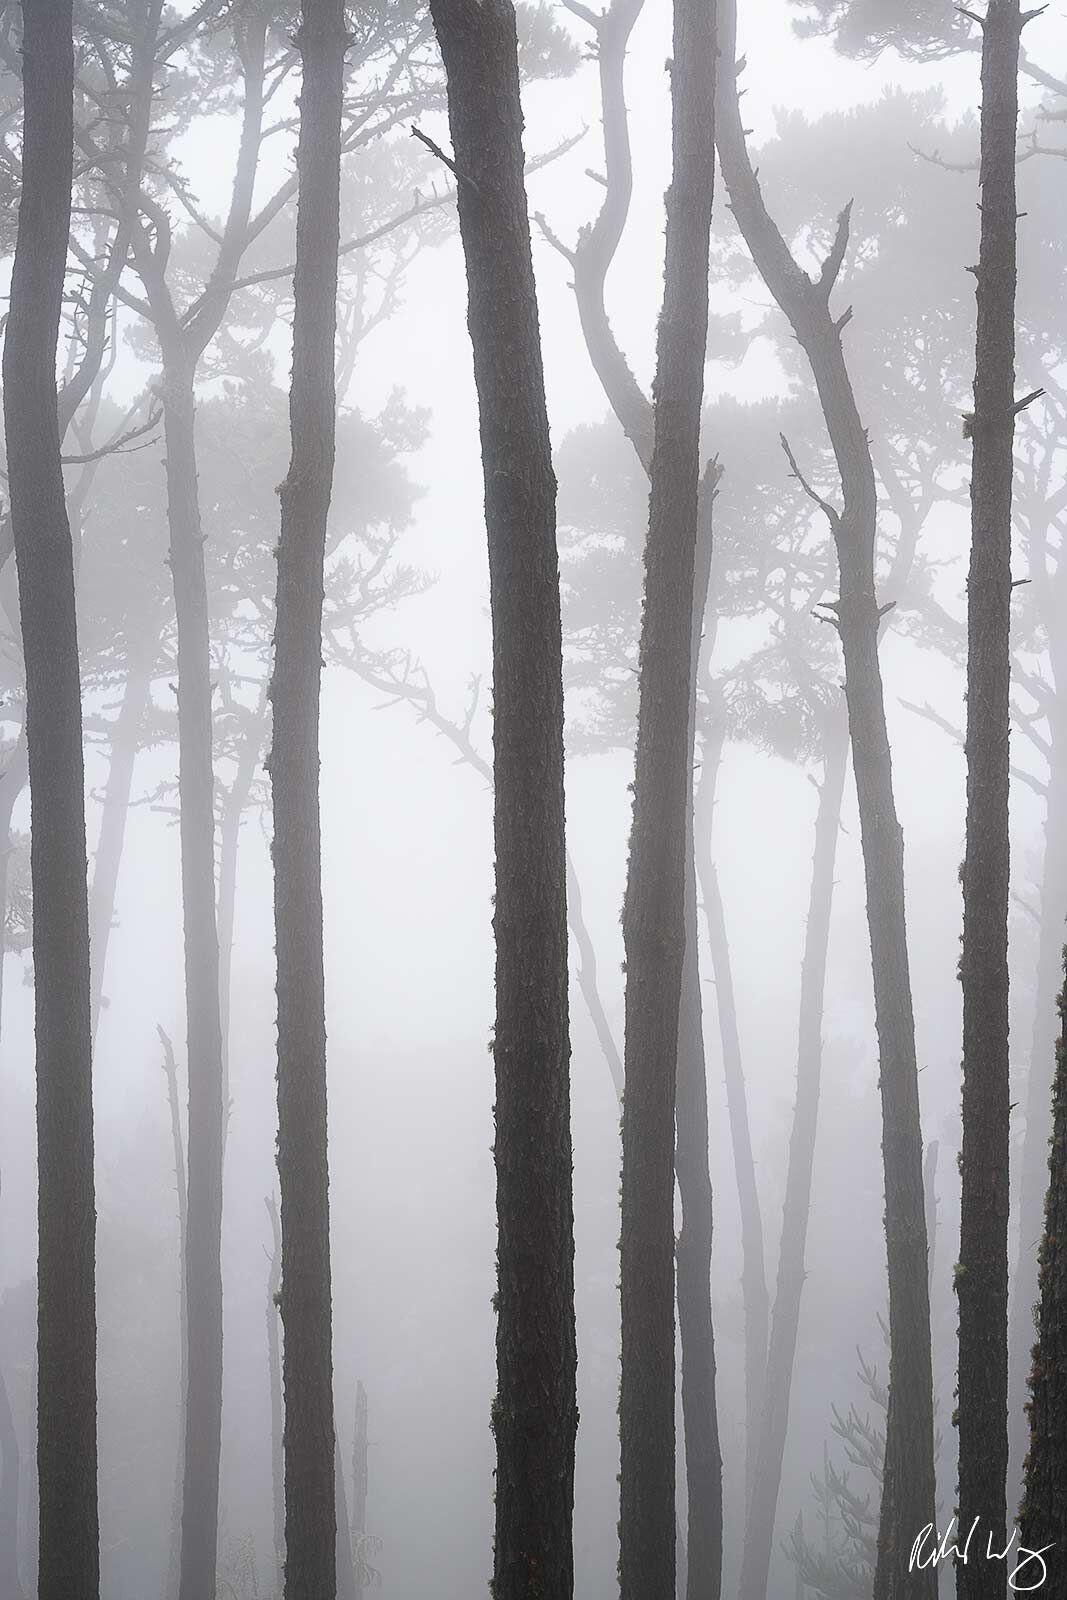 Monterey Pines In Fog, Pebble Beach, California, photo